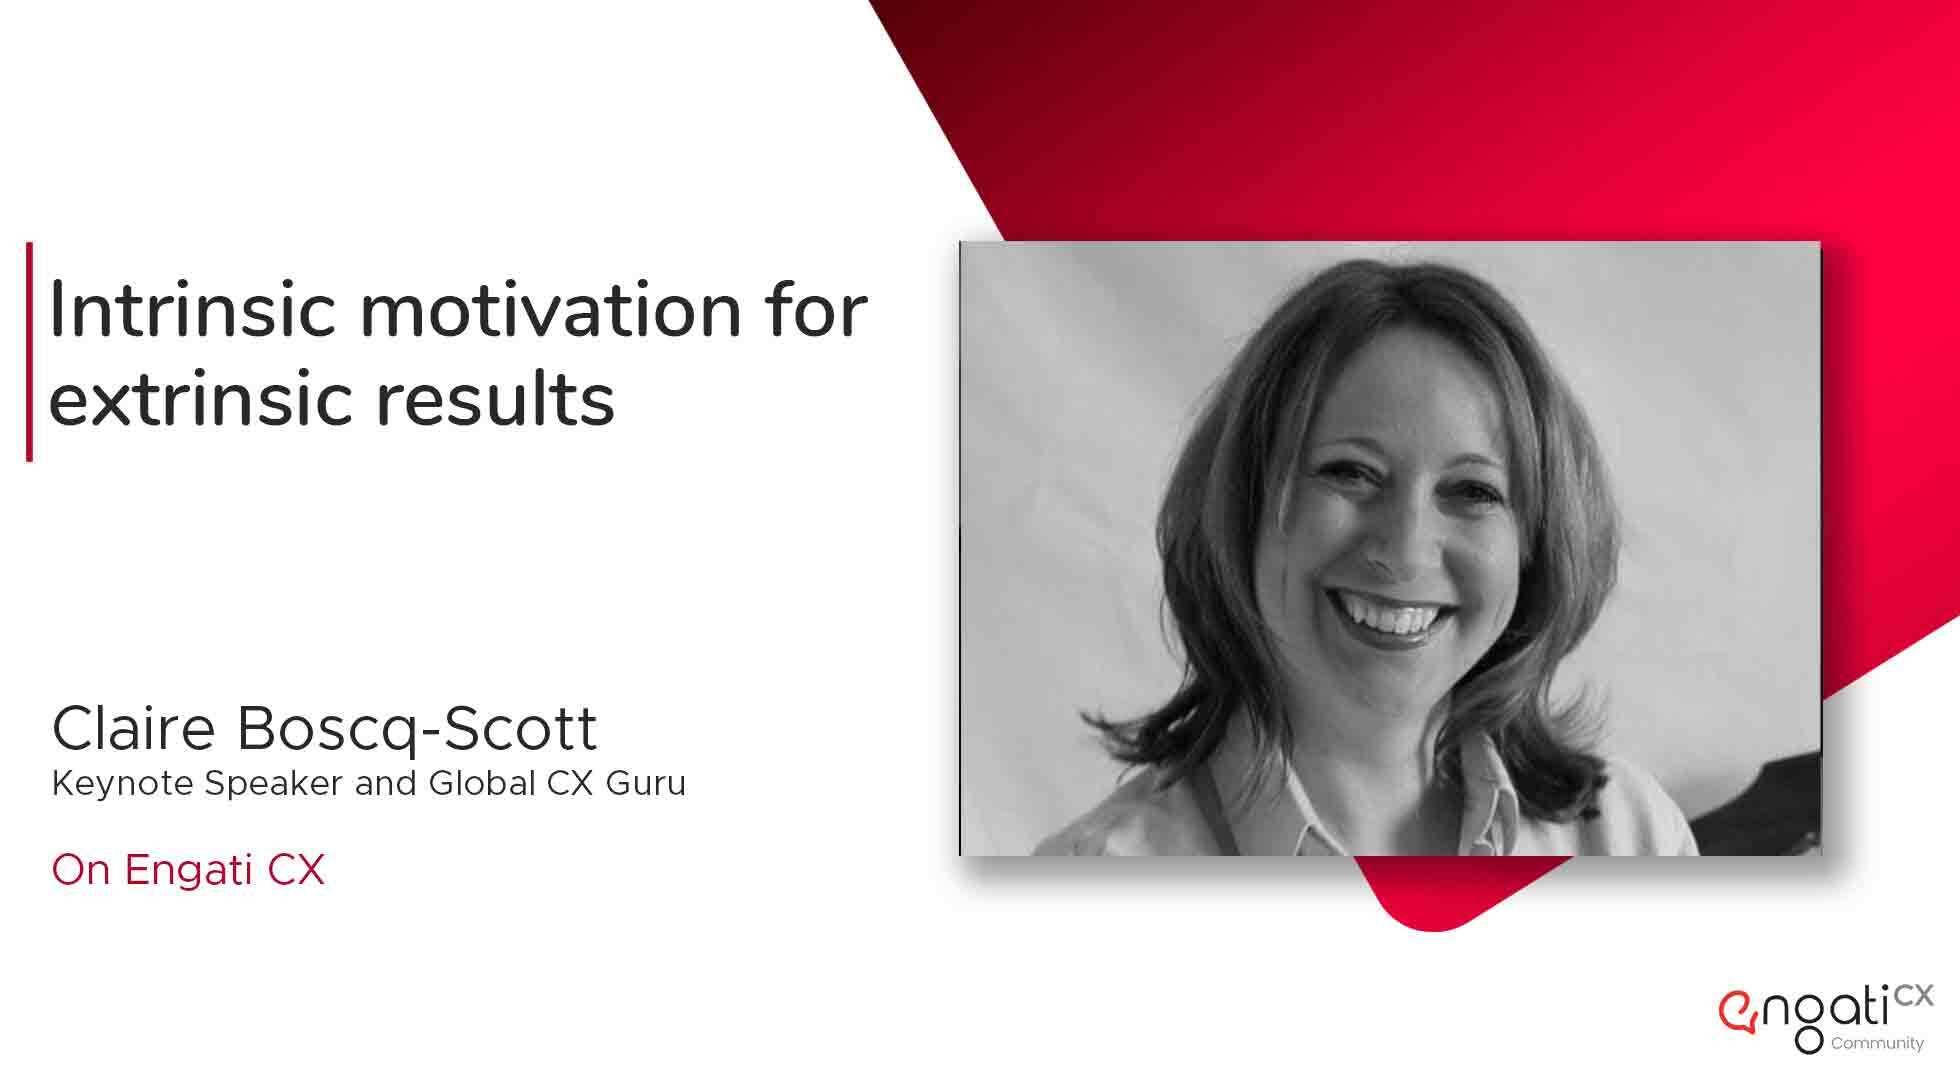 Intrinsic motivation for extrinsic results | Claire Boscq Scott | Engati CX